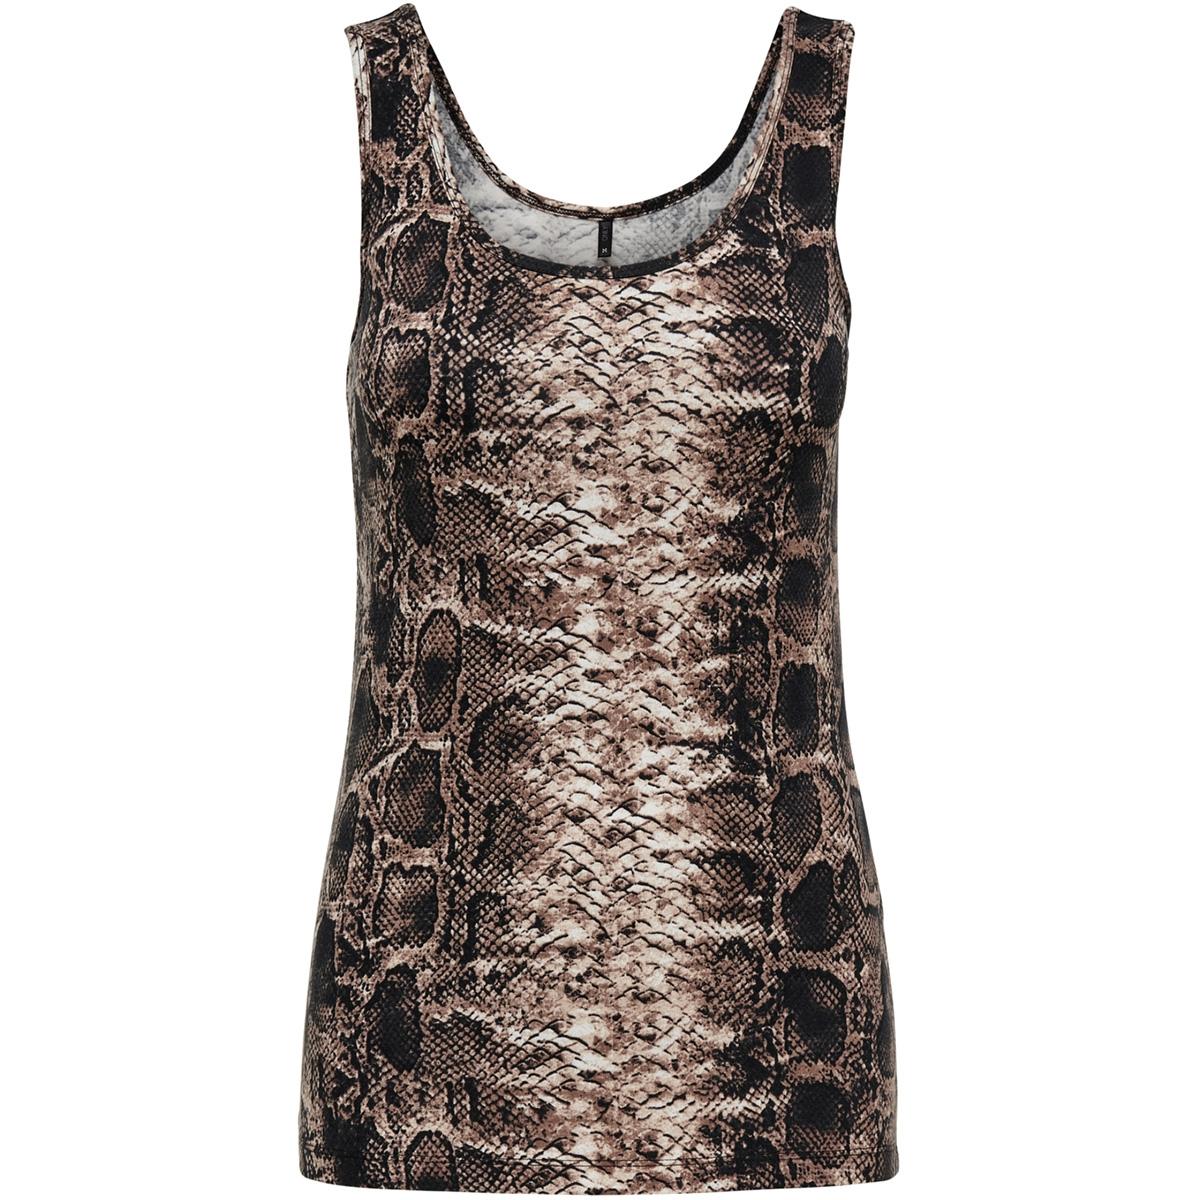 onllive love  printed tank top jrs 15170352 only top black/snake brau